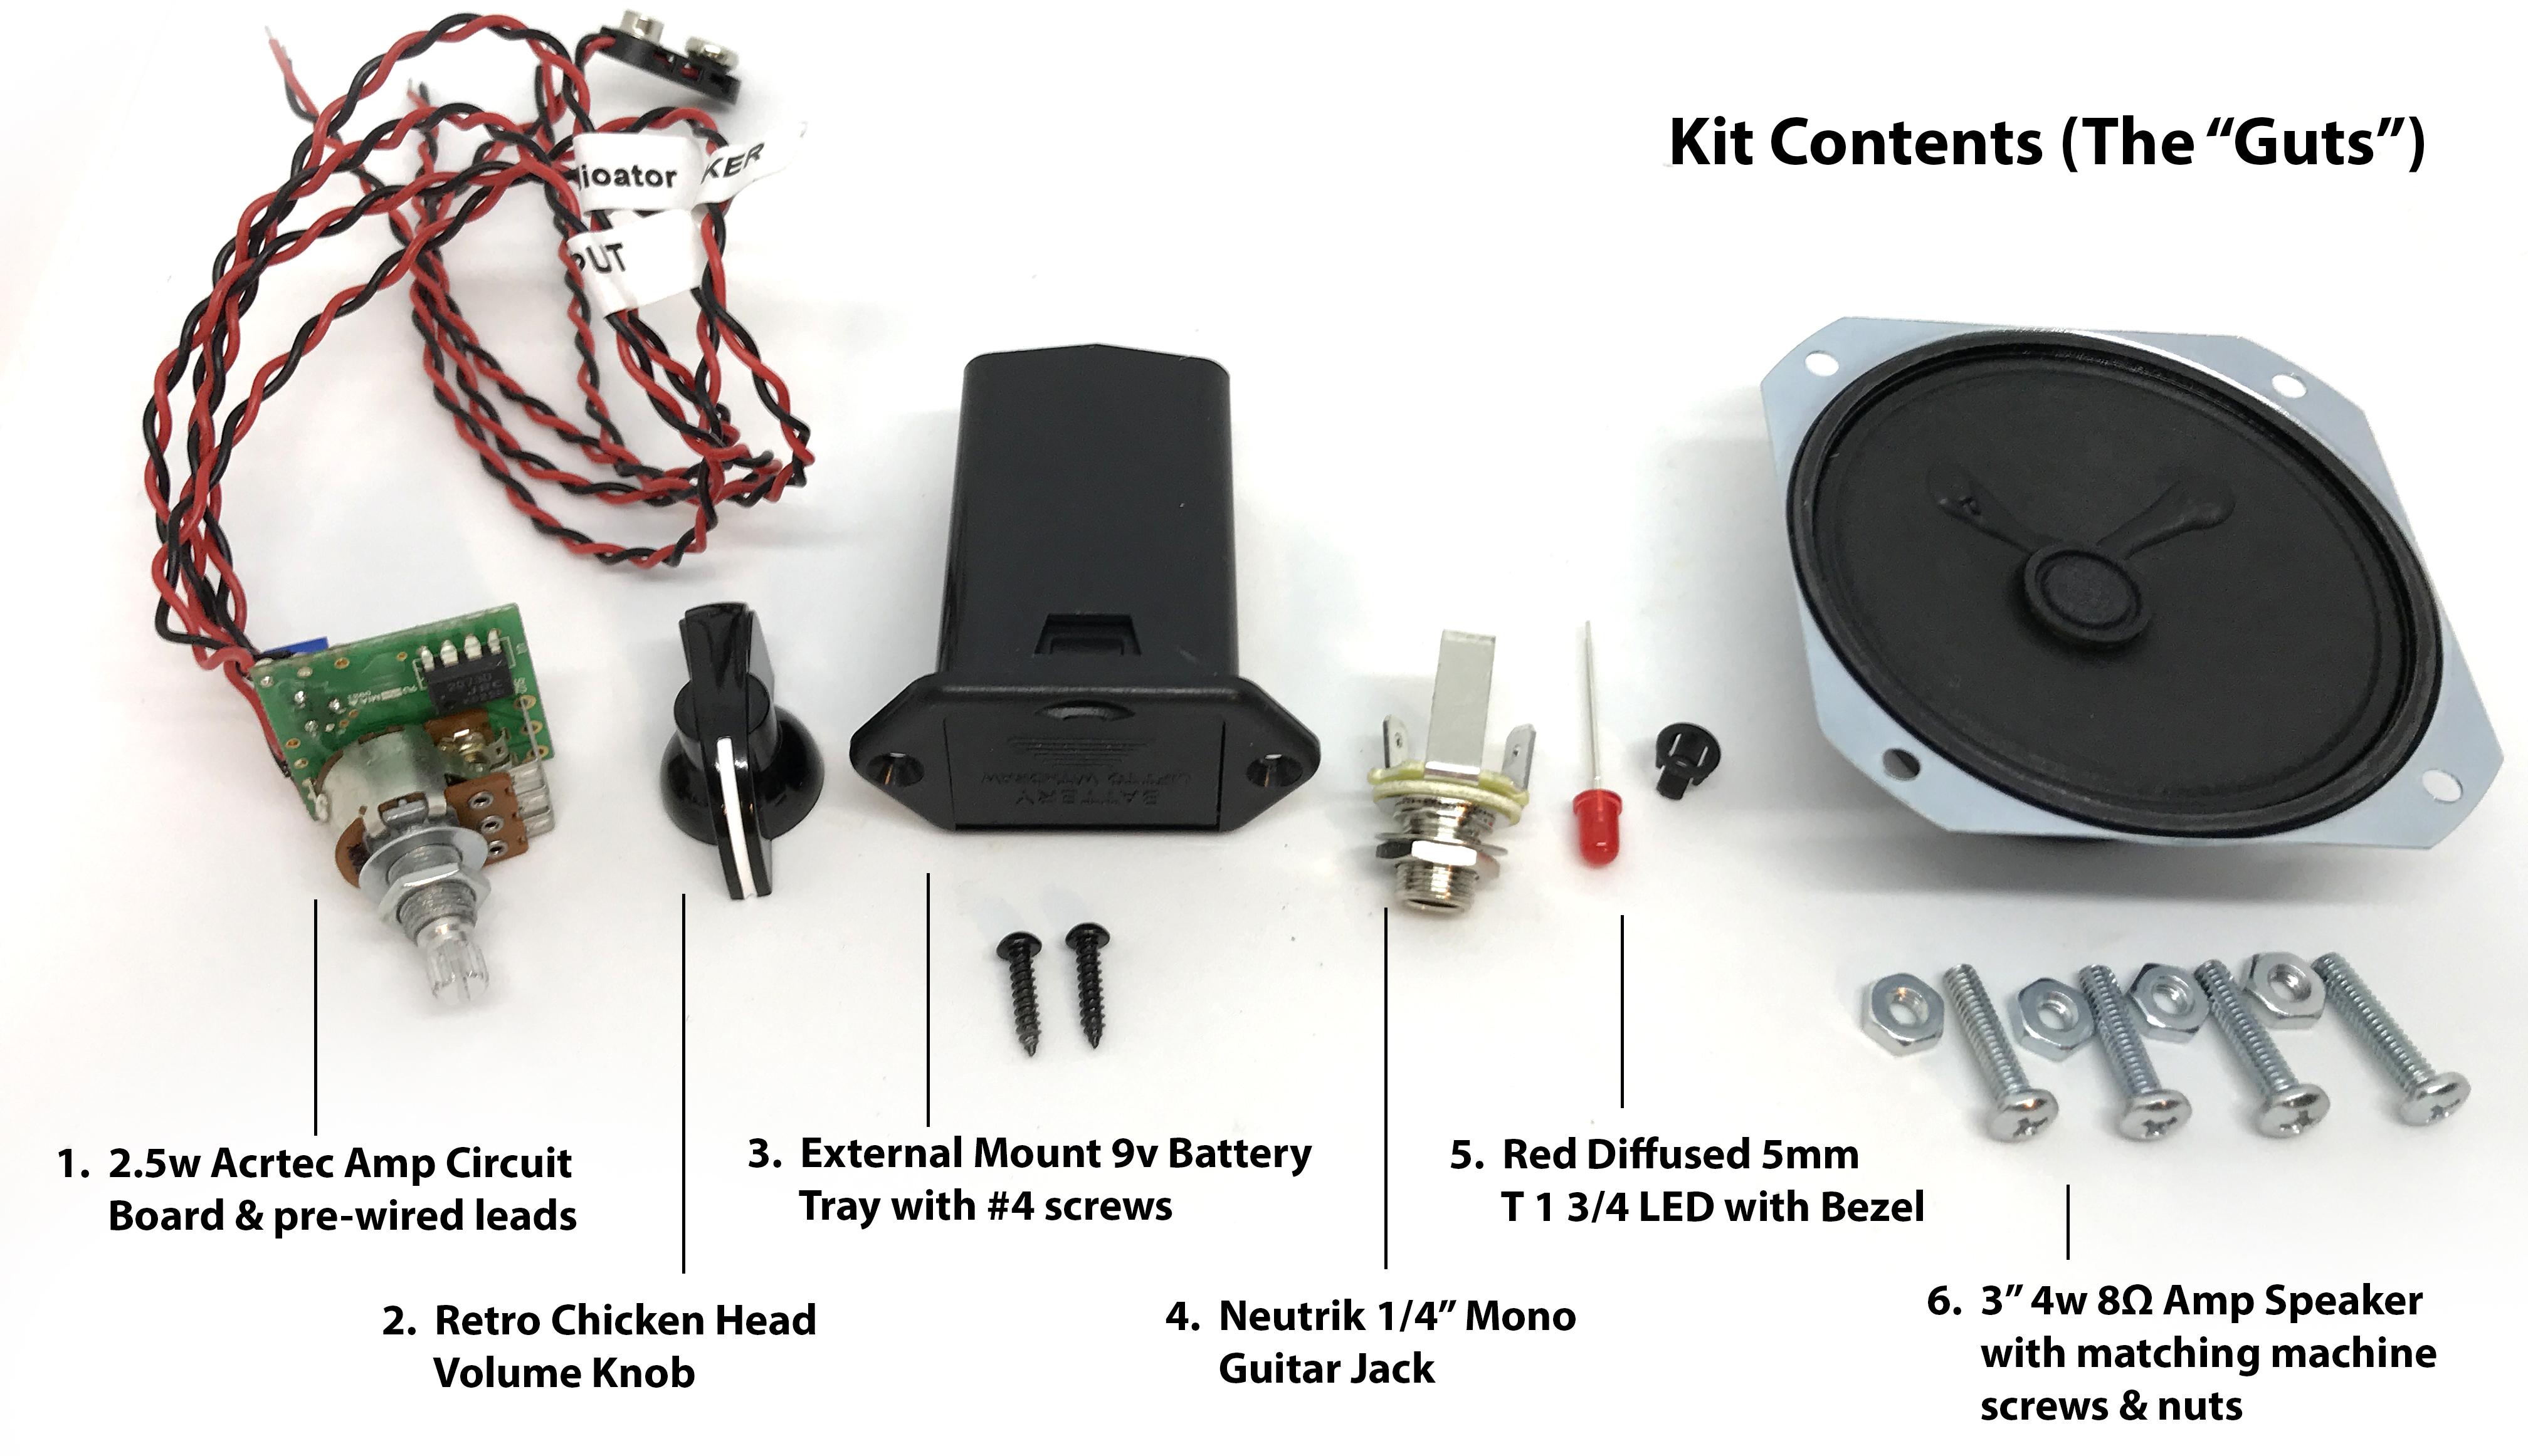 kit-contents-2.jpg